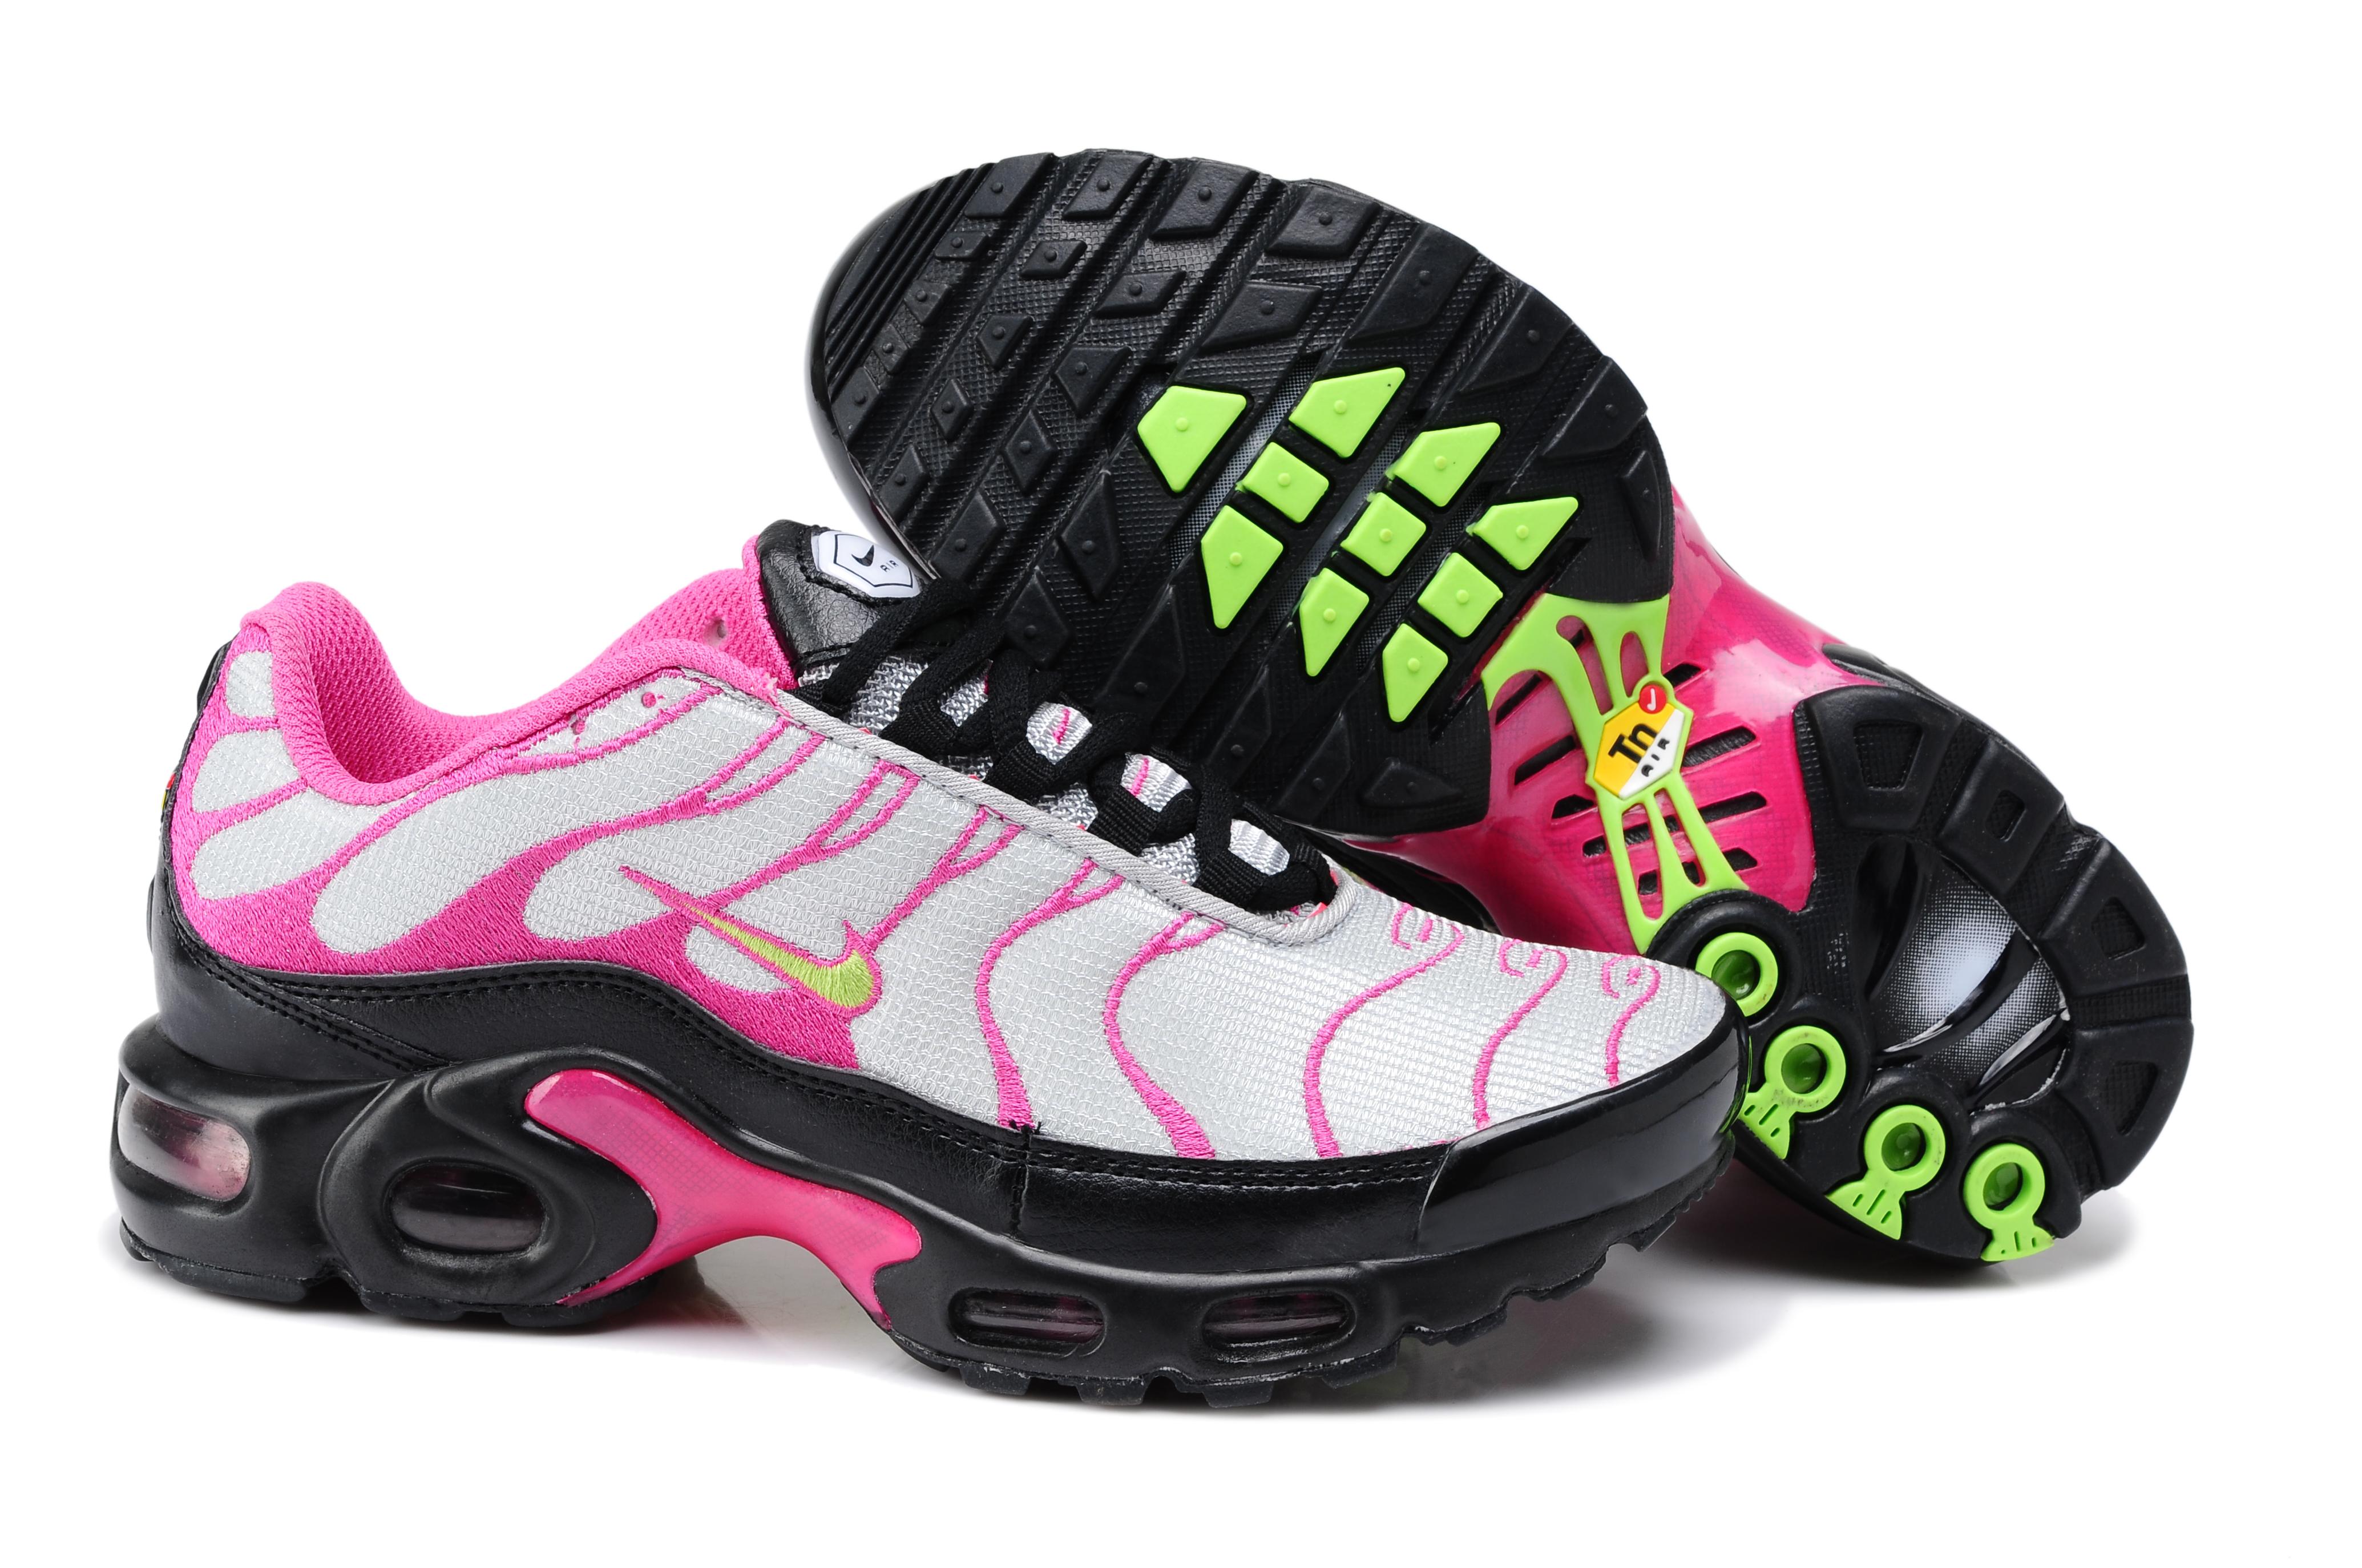 quality design 47822 9649a Homme Tn Vi Pas Air Cher Torch Max Femme 2016 Nike SpVUMz